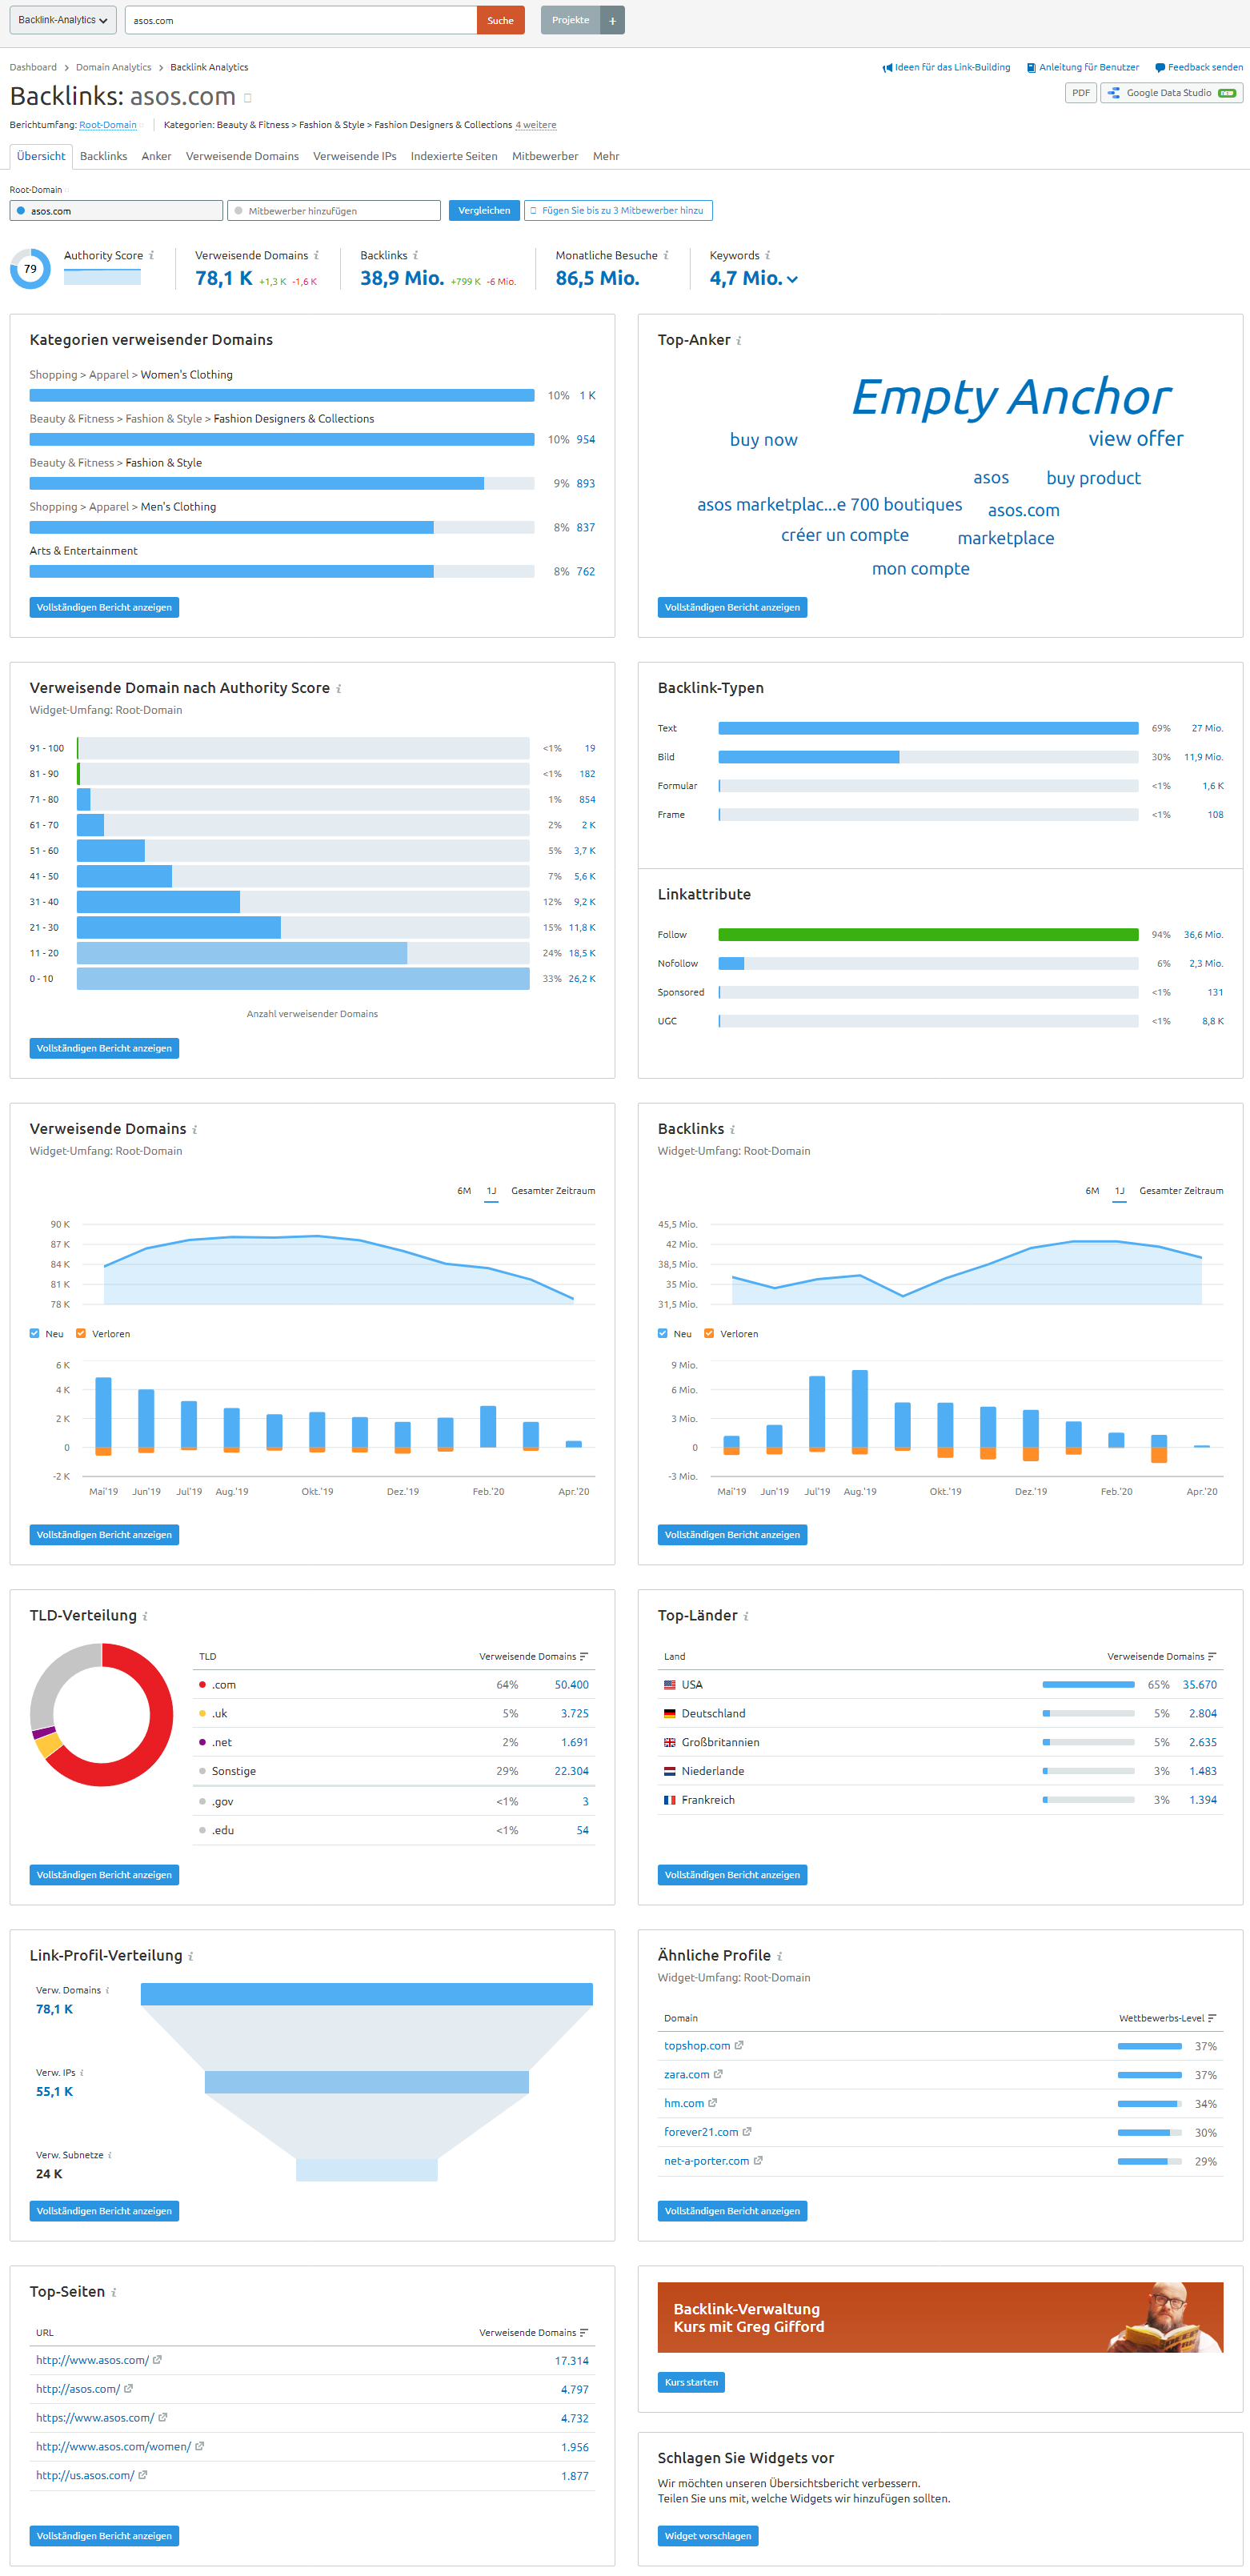 Screenshot: Daten aus SEMrush Backlink-Analytics